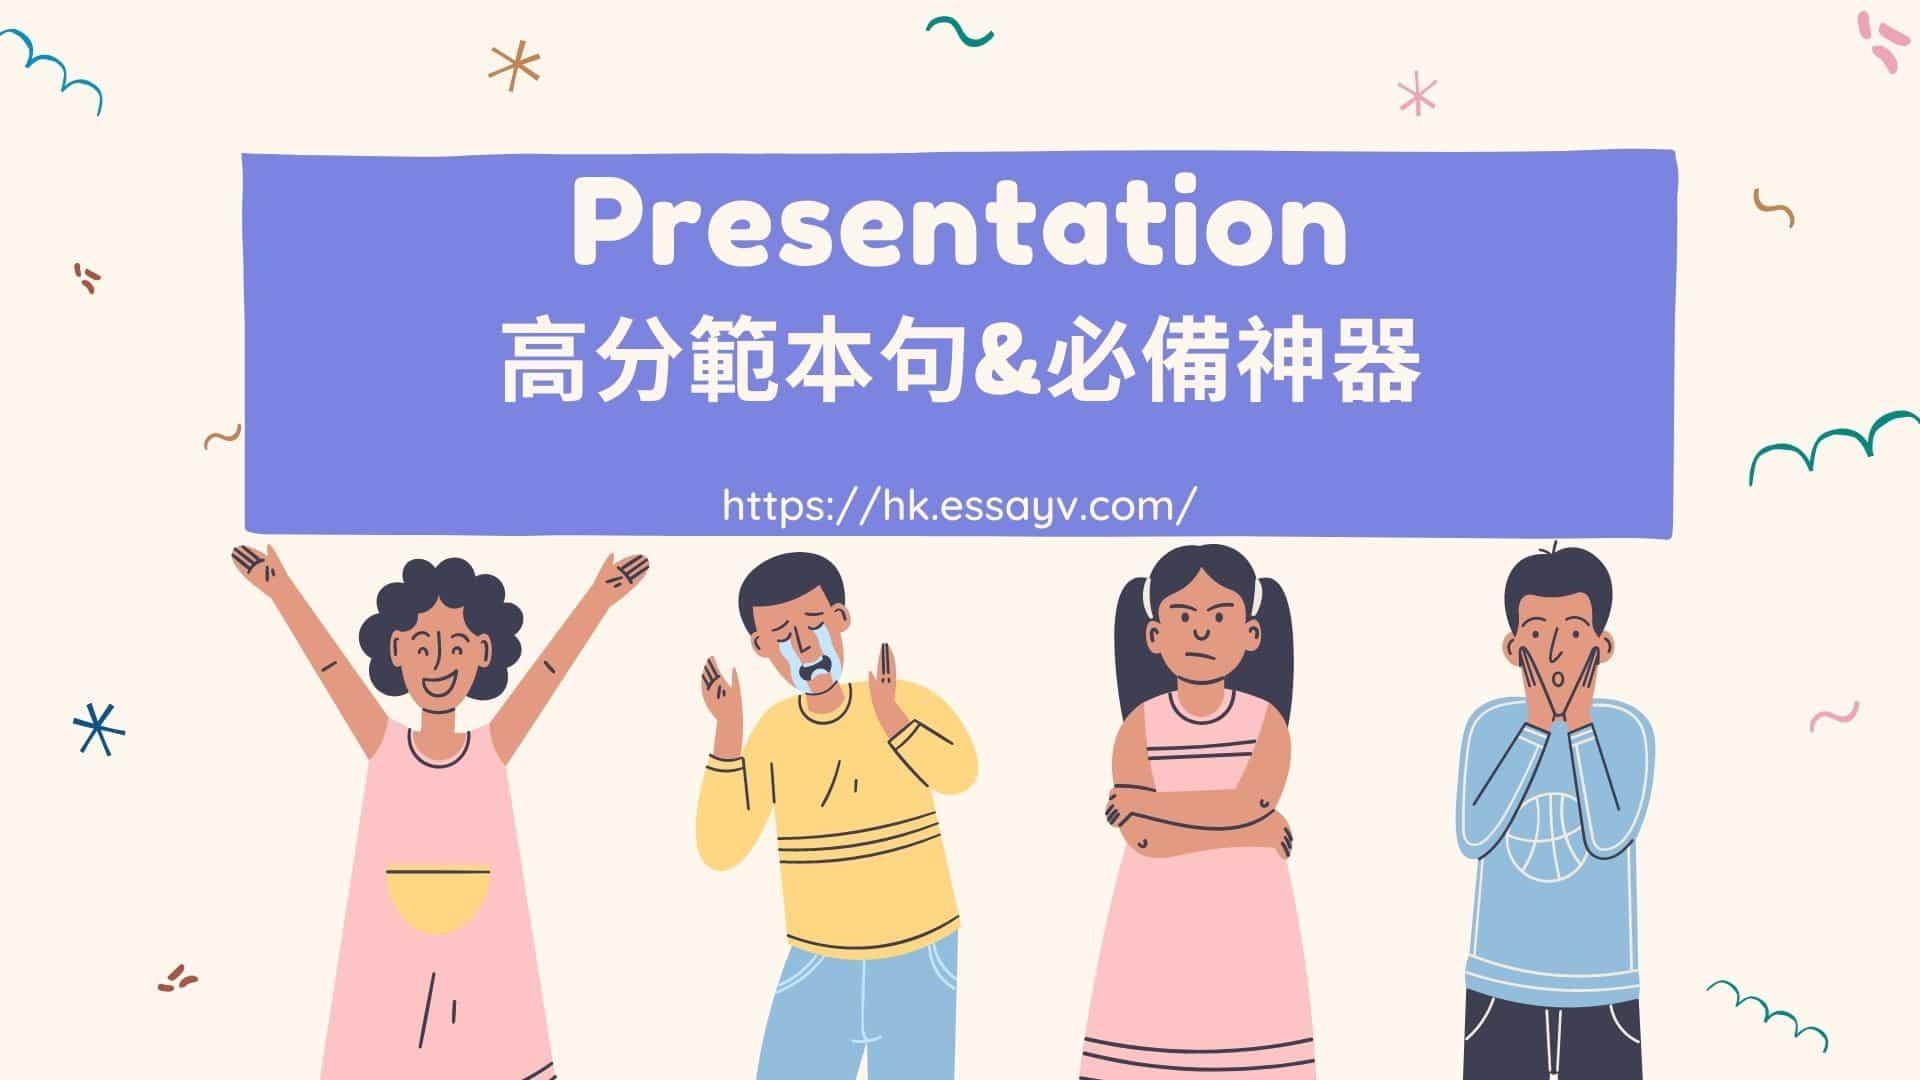 Presentation 高分範本句&必備神器